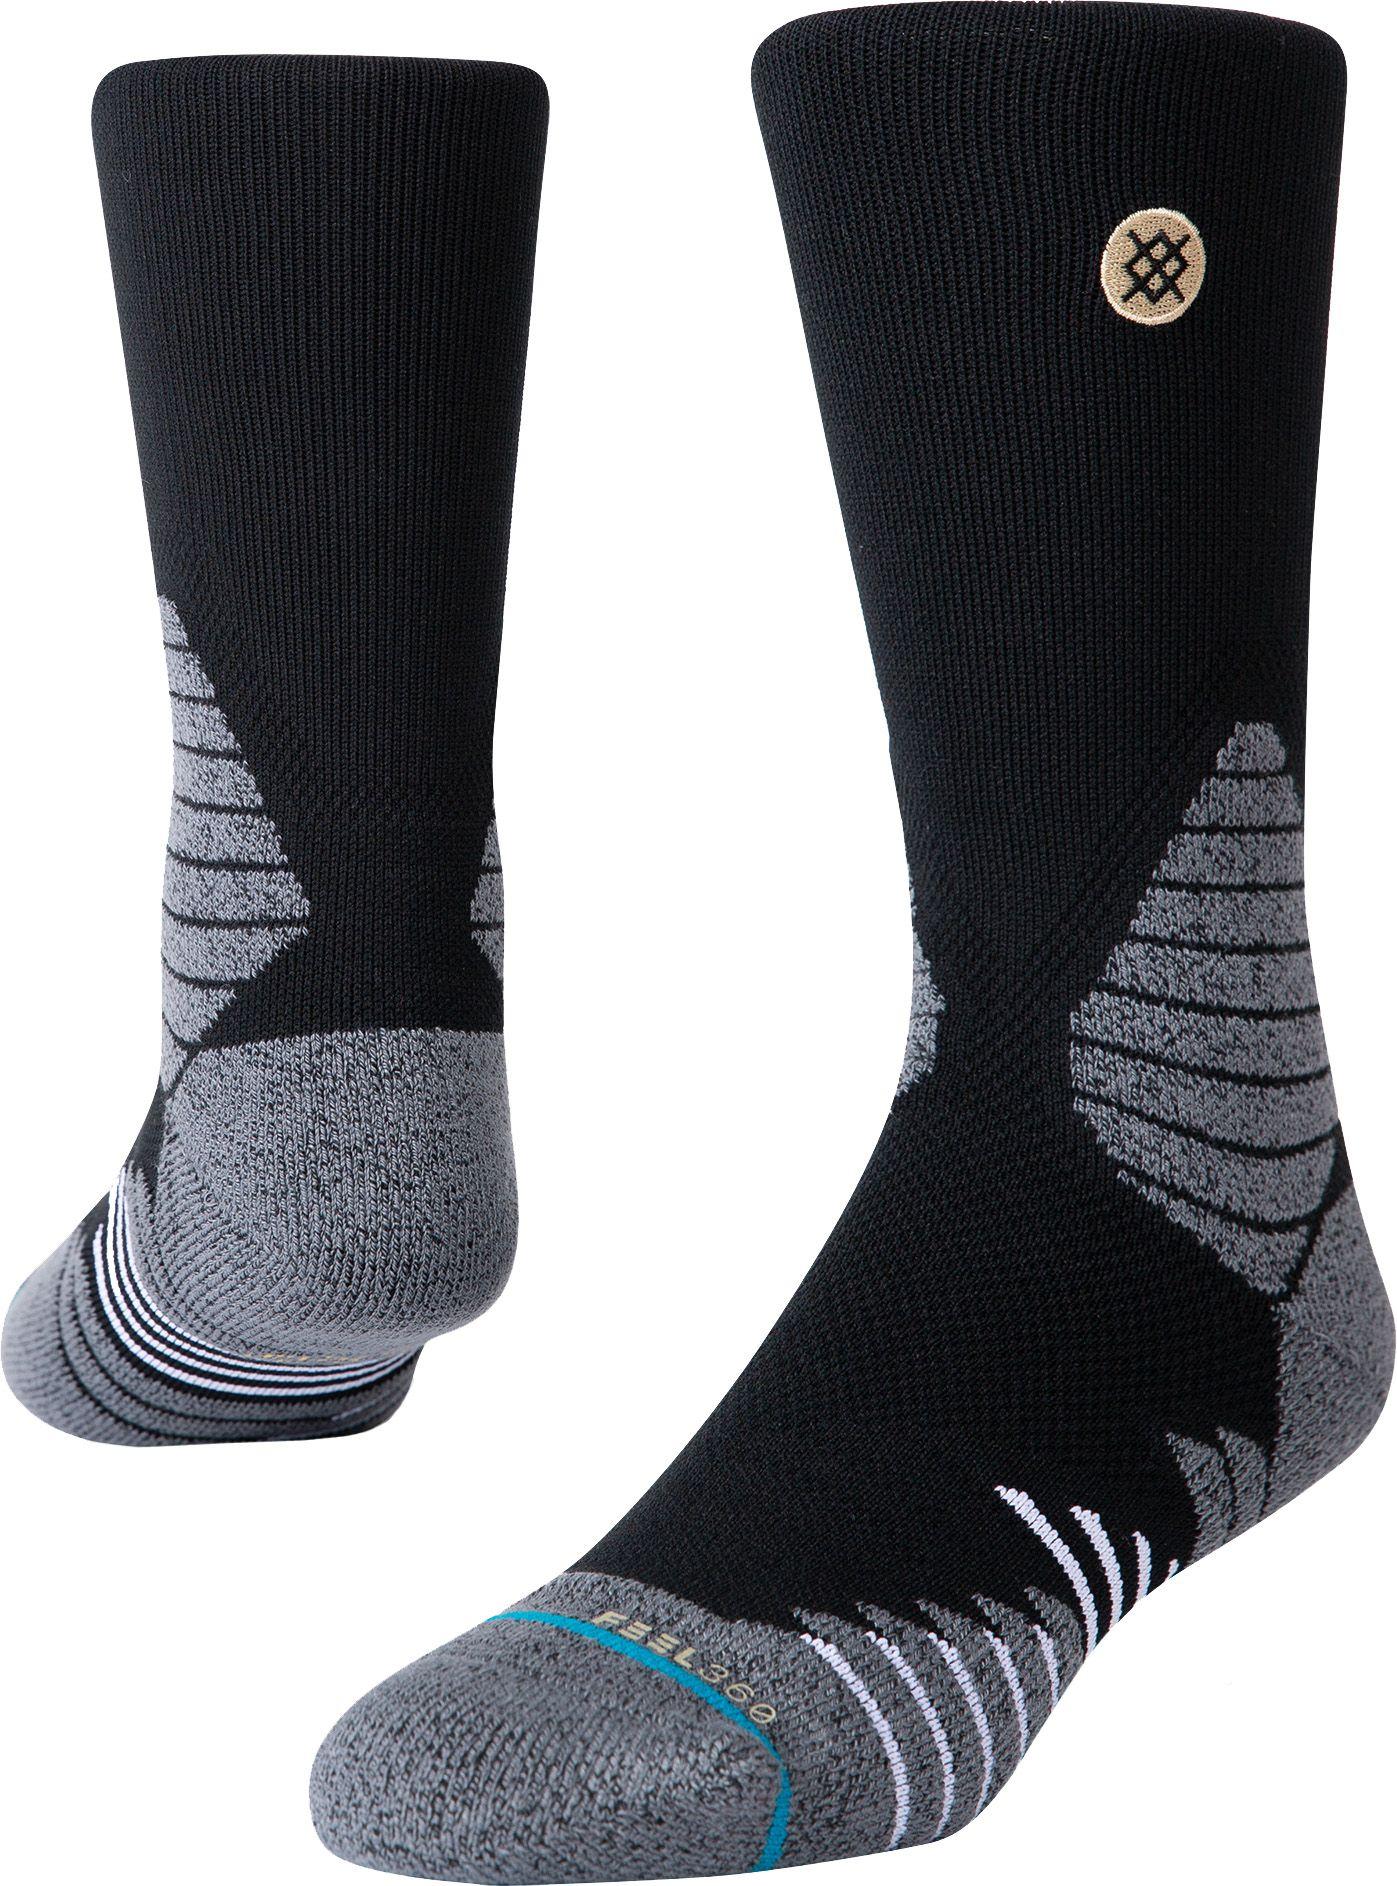 Stance Adult Icon Hoops Crew Socks, Large, Black